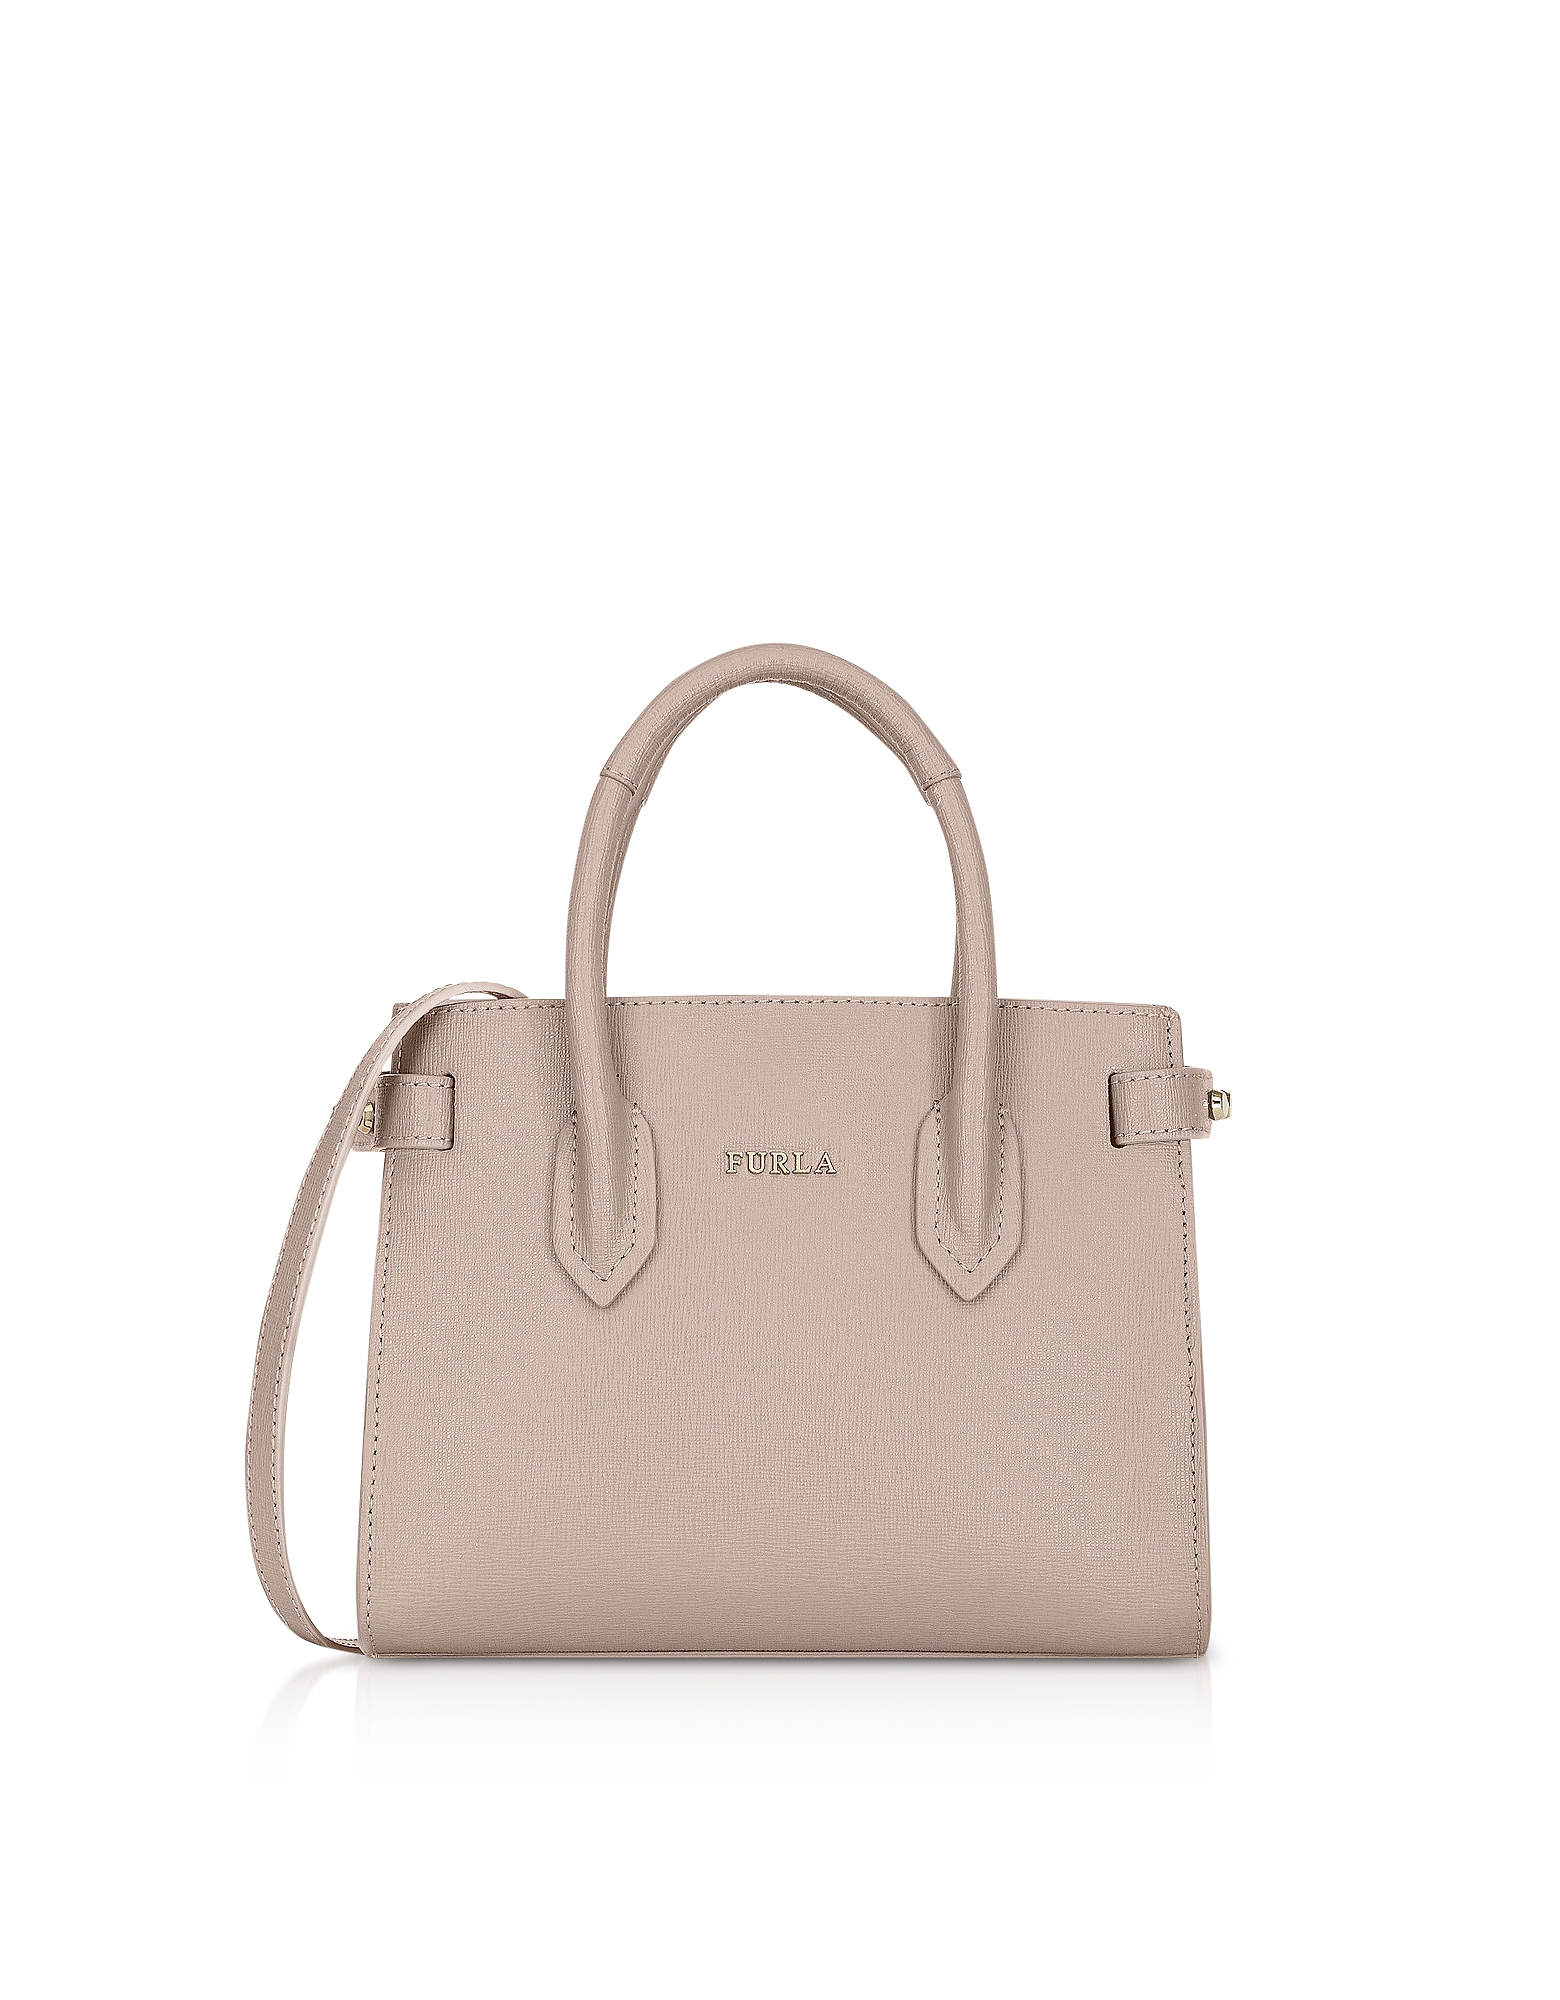 Furla Handbags, Saffiano Leather Pin Mini Tote Bag